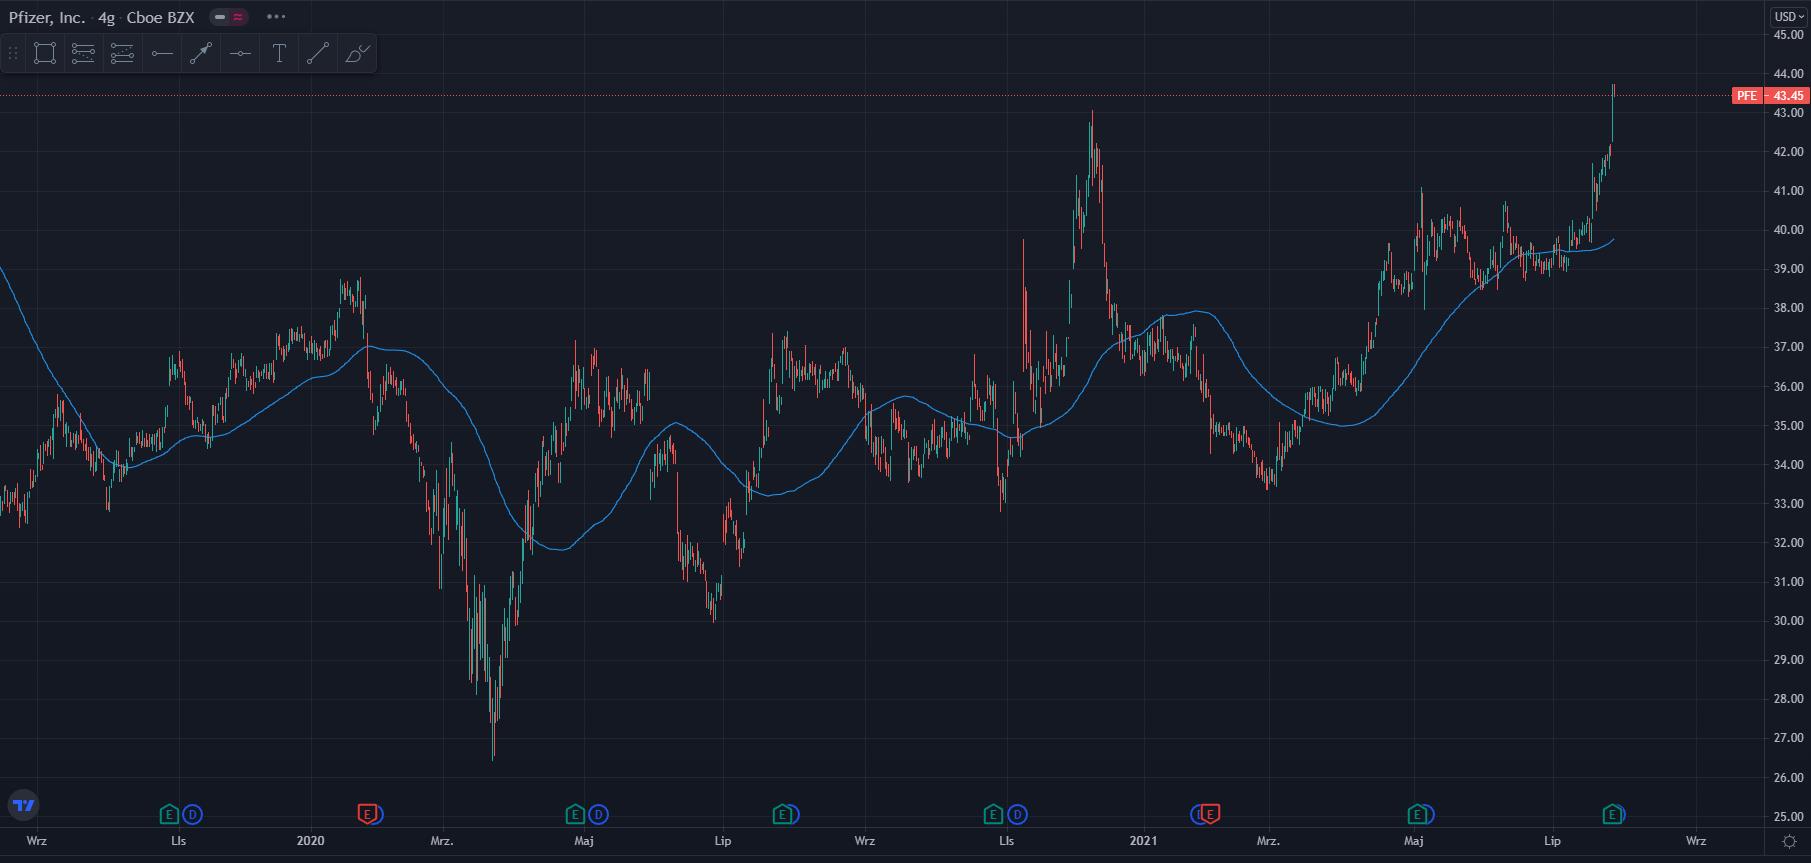 wykres Kurs akcji Pfizer H4 29.07.2021